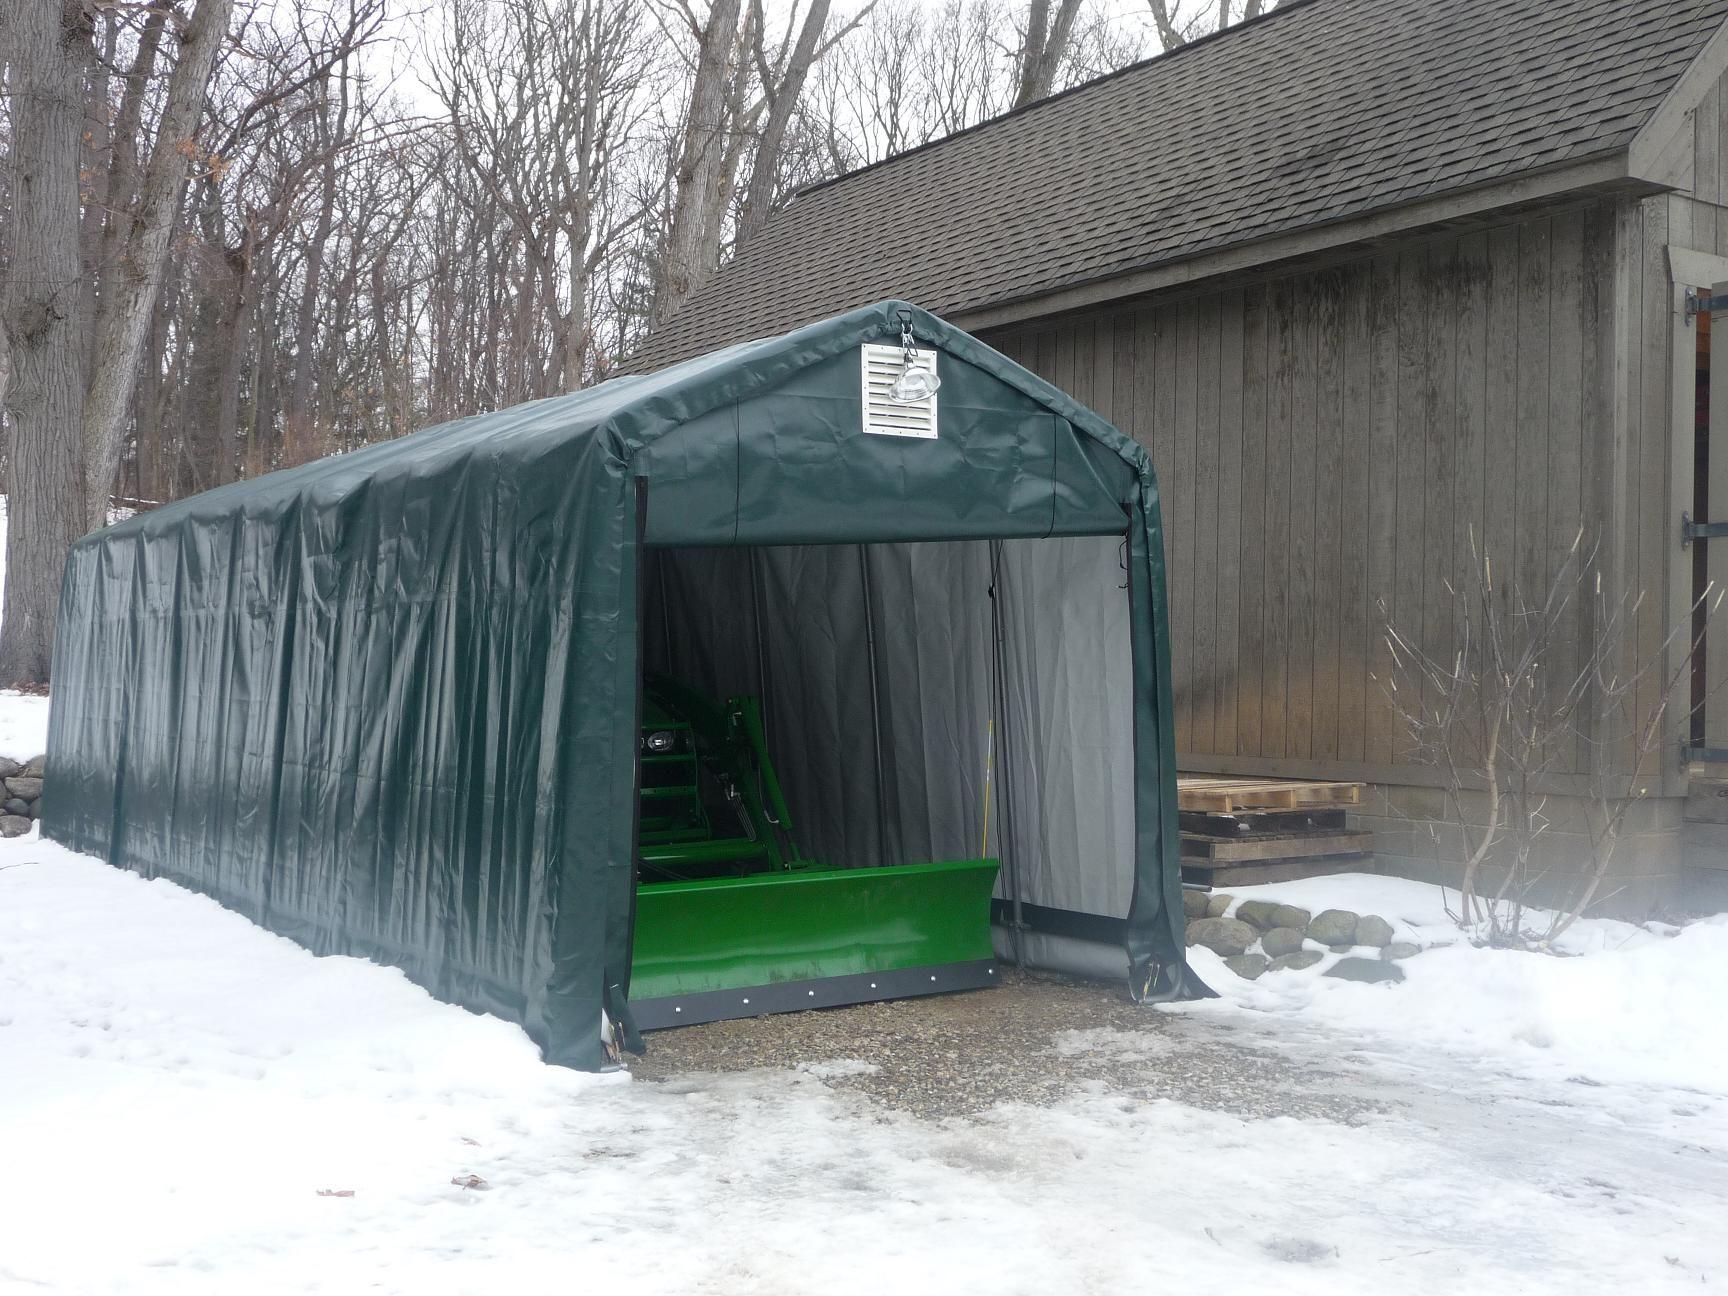 barn homestead com garages outdoor portable amazon h l x model dp w style garden green shelterlogic garage canopies